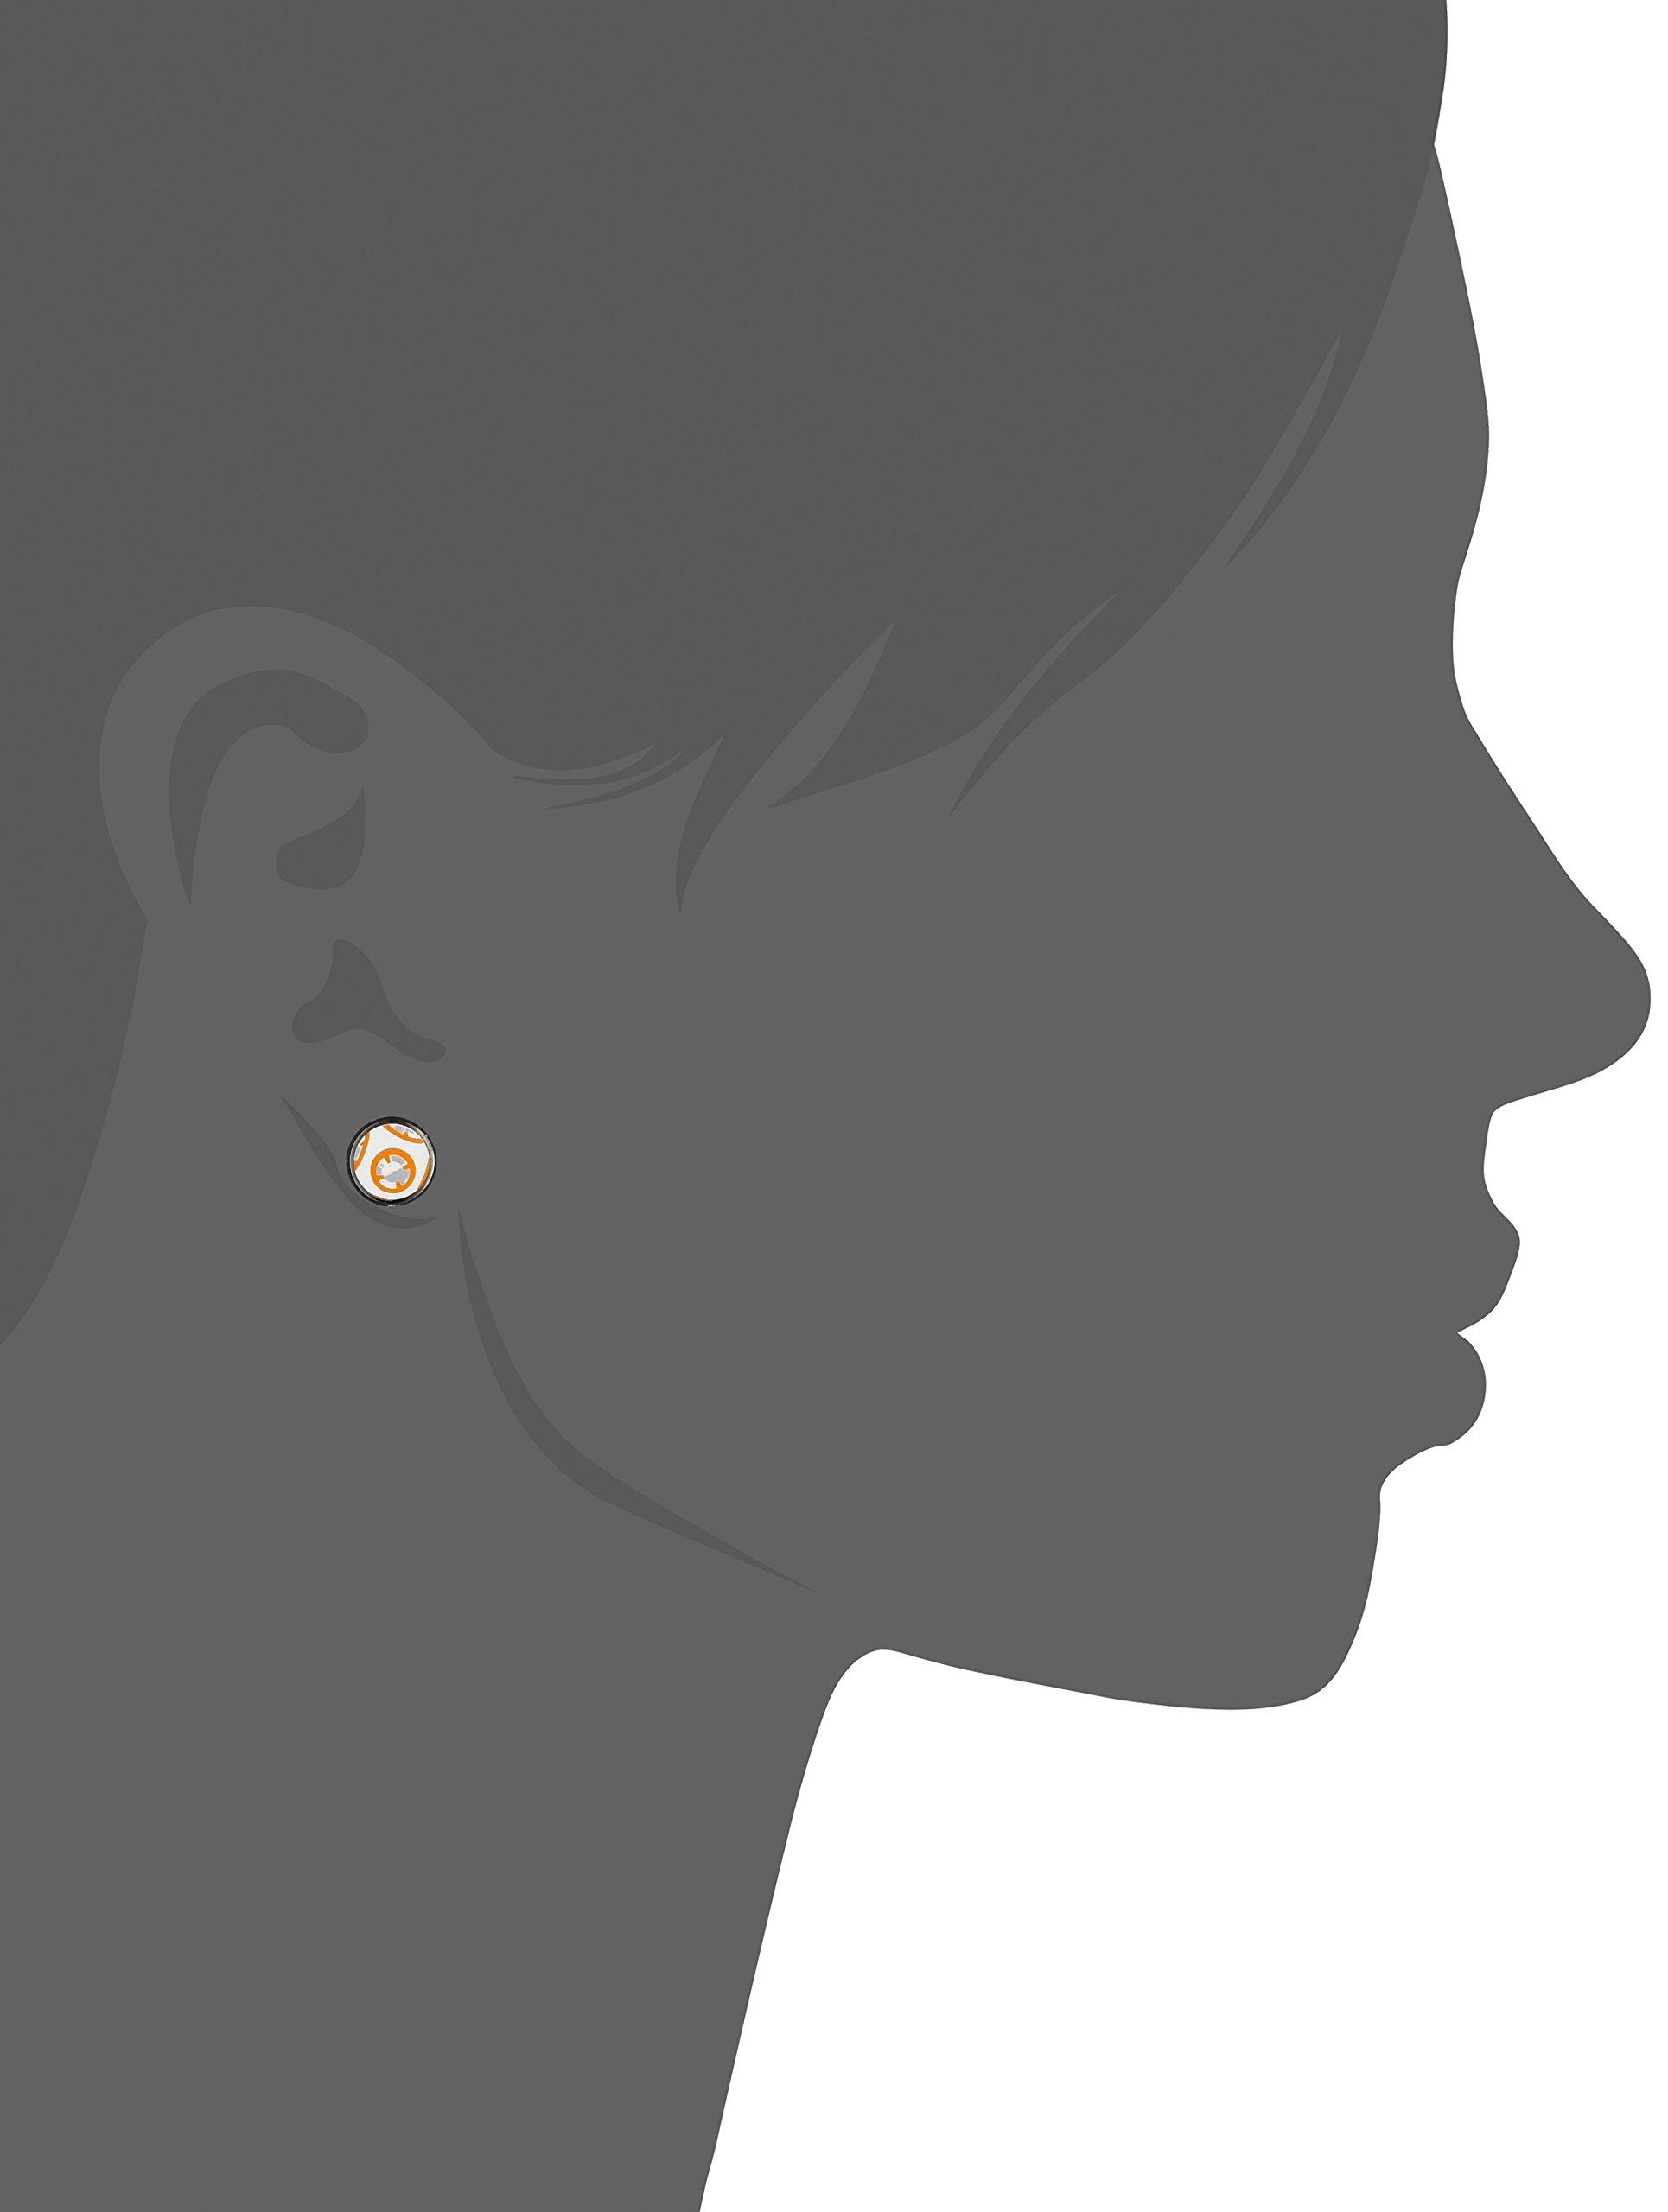 Star Wars Jewelry Unisex Episode 7 BB-8 Droid Stainless Steel Stud Earrings